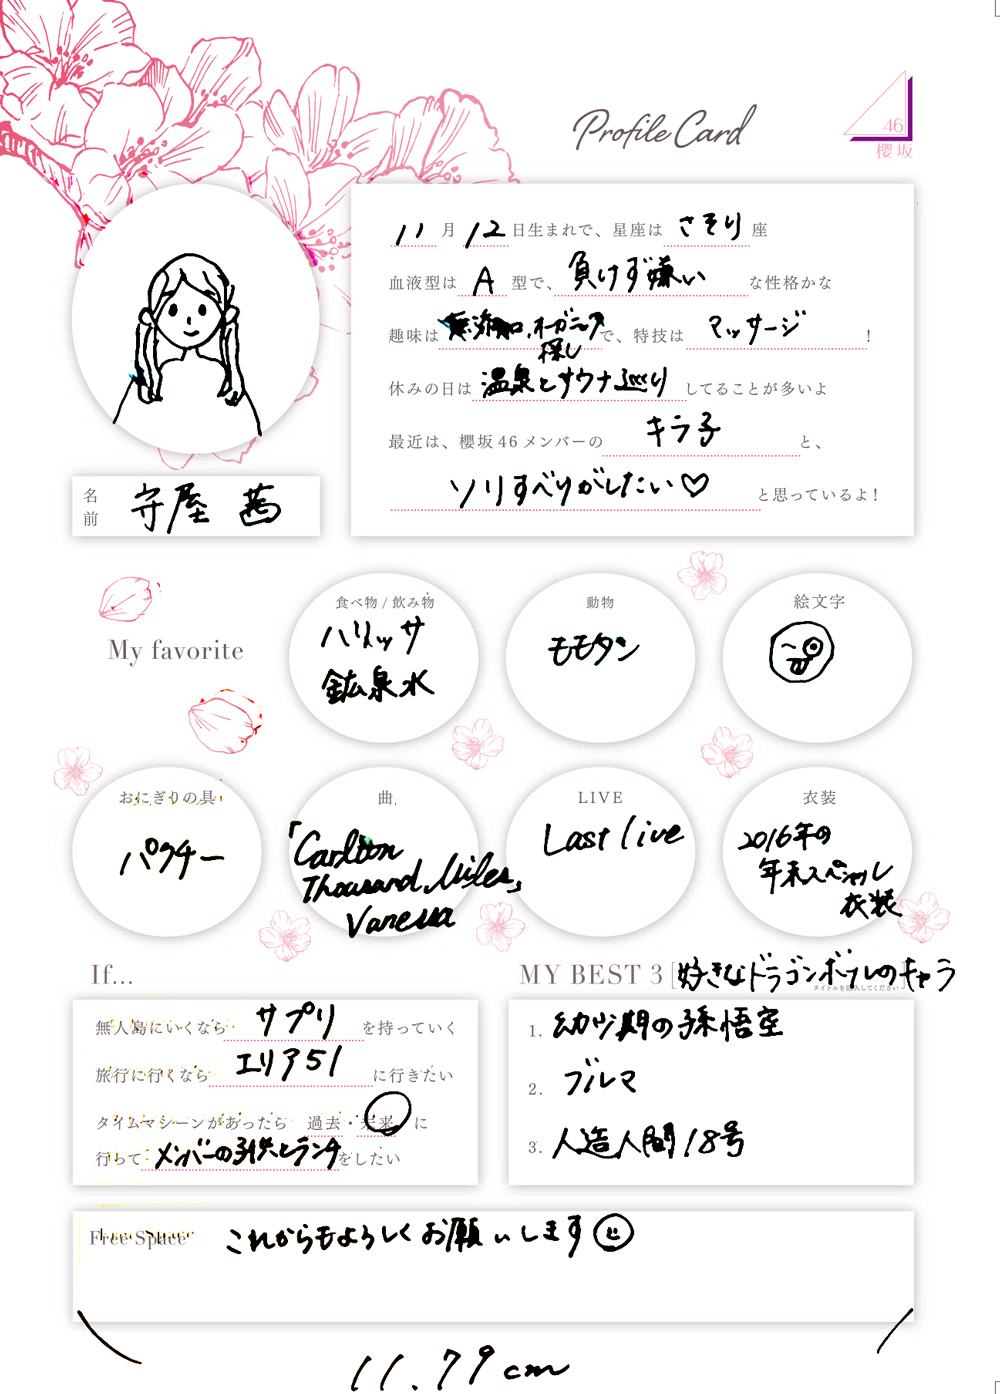 card_001-24